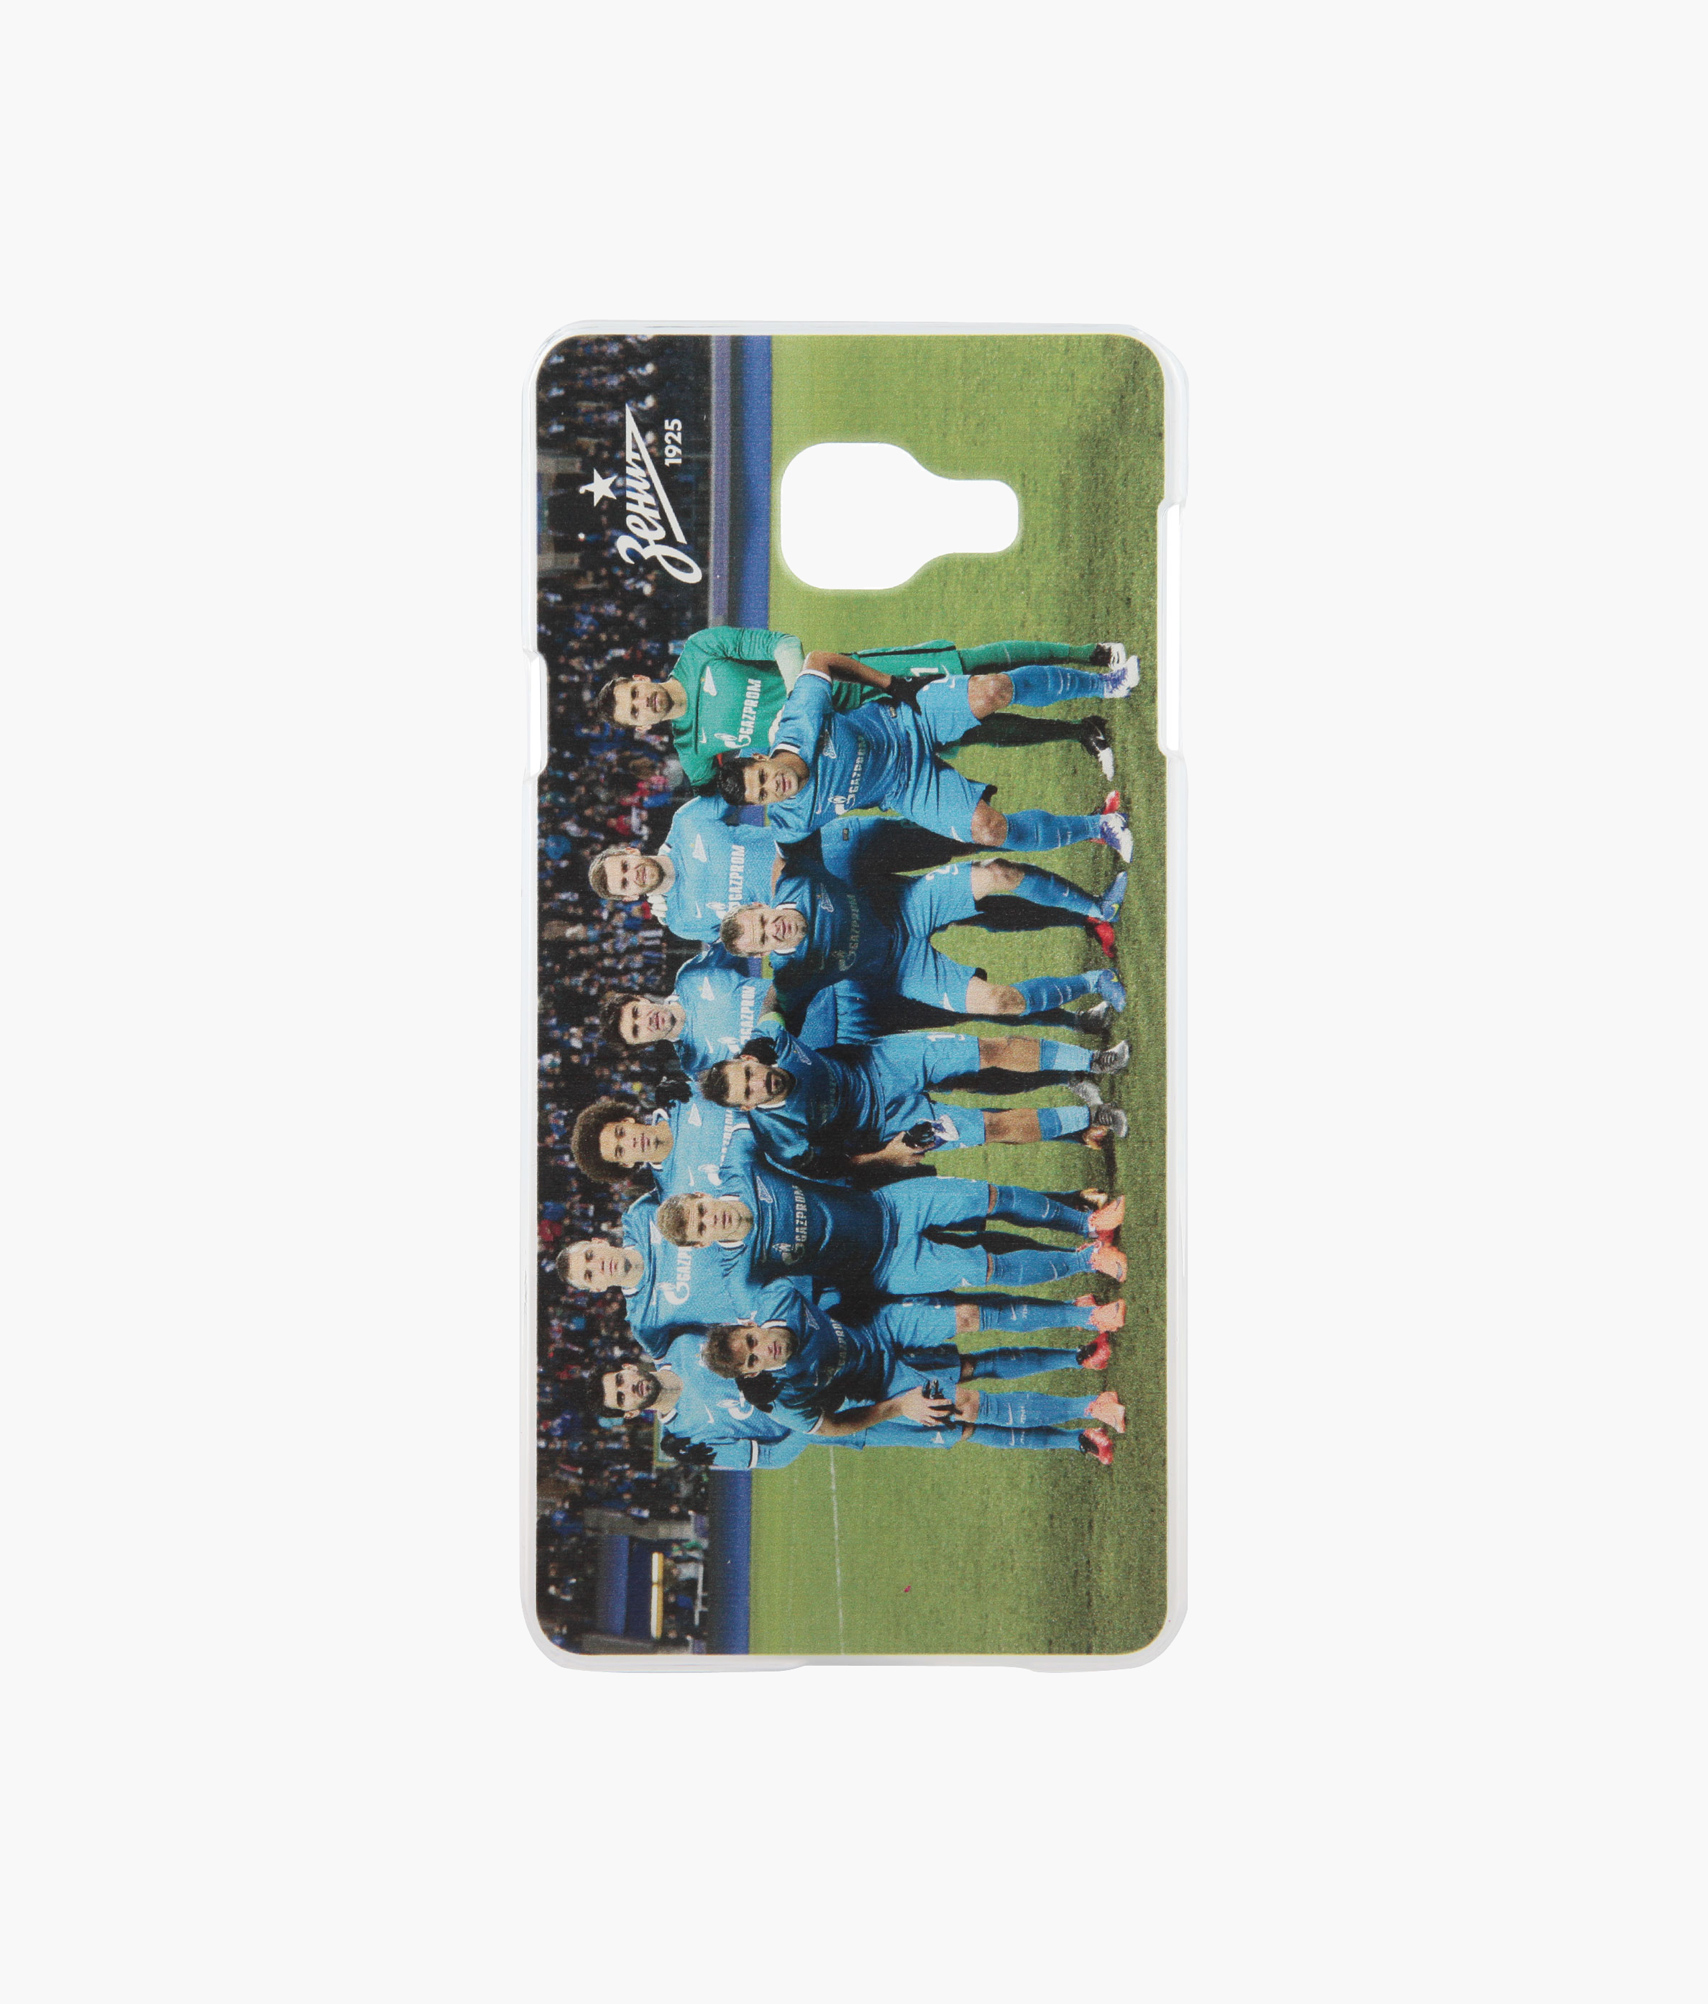 Фото - Чехол Samsung Galaxy A7(2016) «Команда» Зенит аксессуар чехол neypo для samsung galaxy a70 2019 premium silver nsb11648